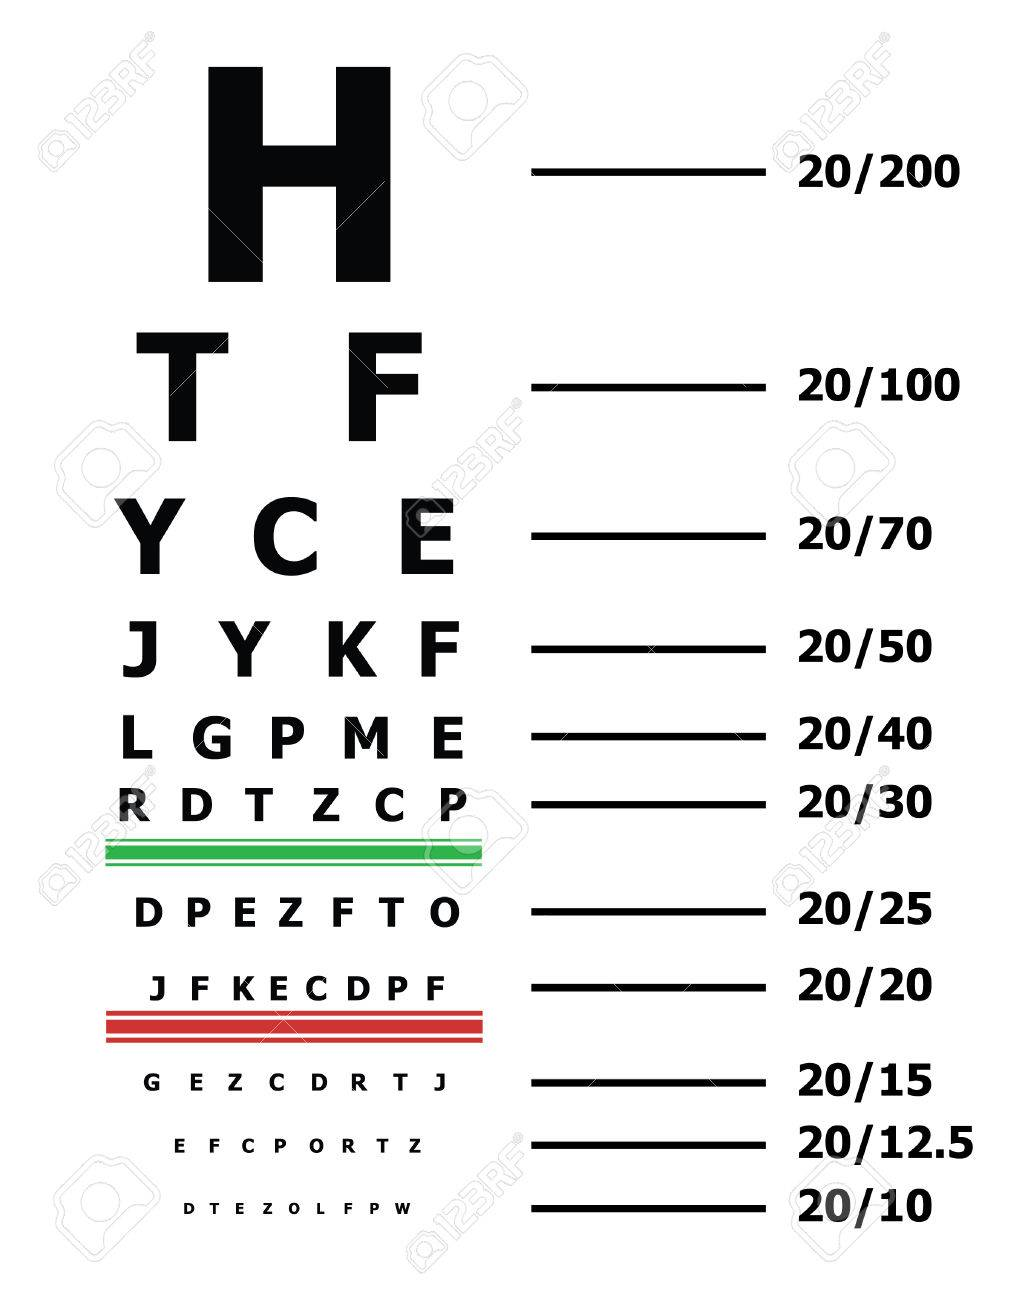 Таблица снеллена английская таблица проверки зрения